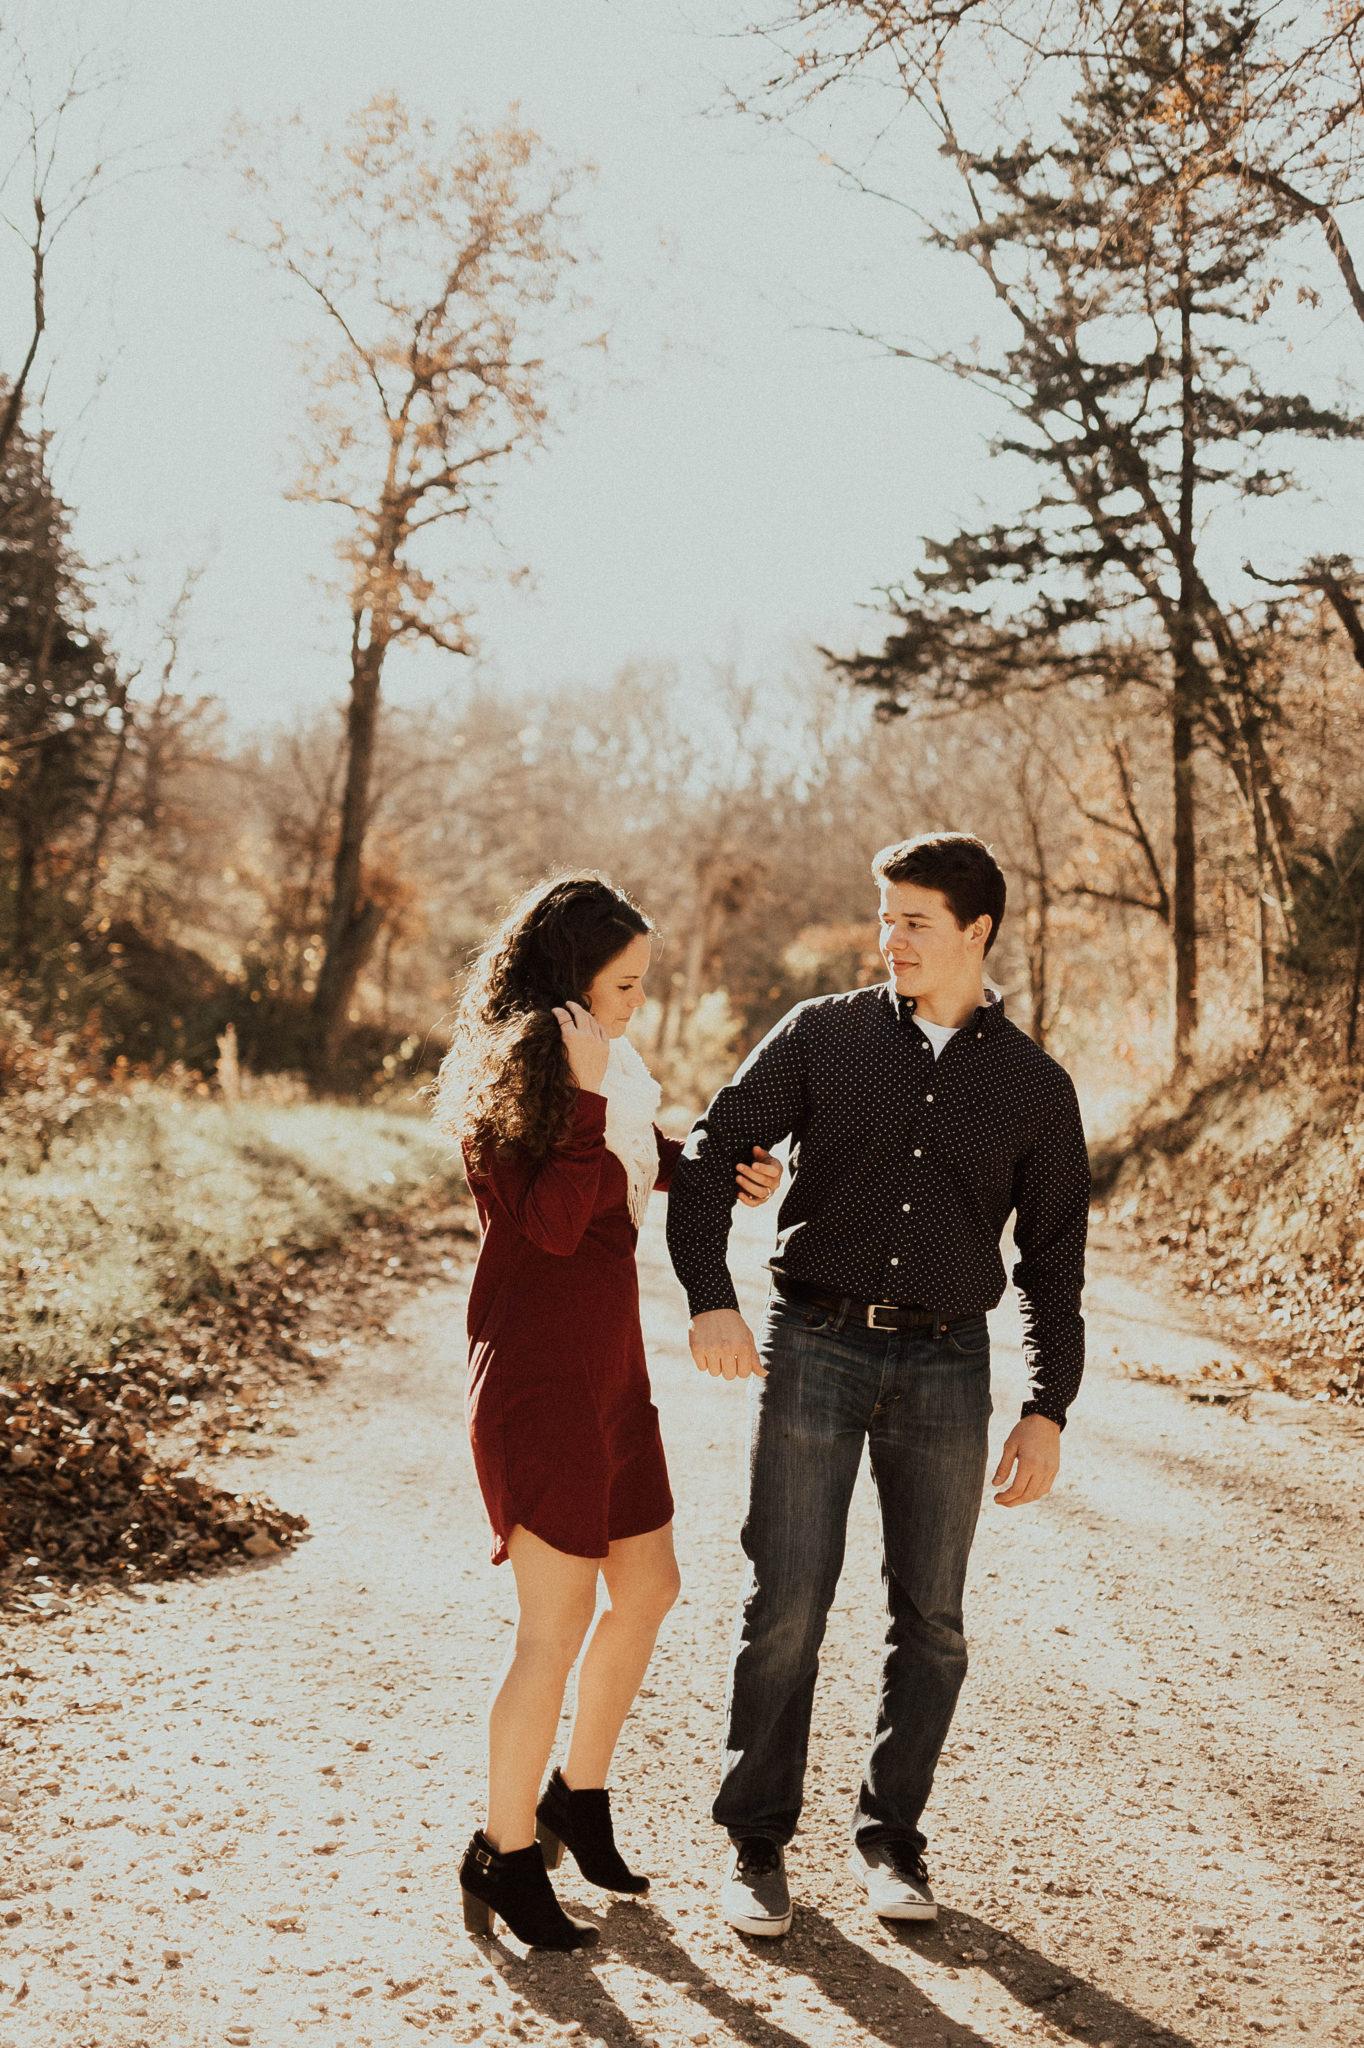 Wedding otographyCentral F Lauren Illinois JordanShelby f6Y7Ivgby